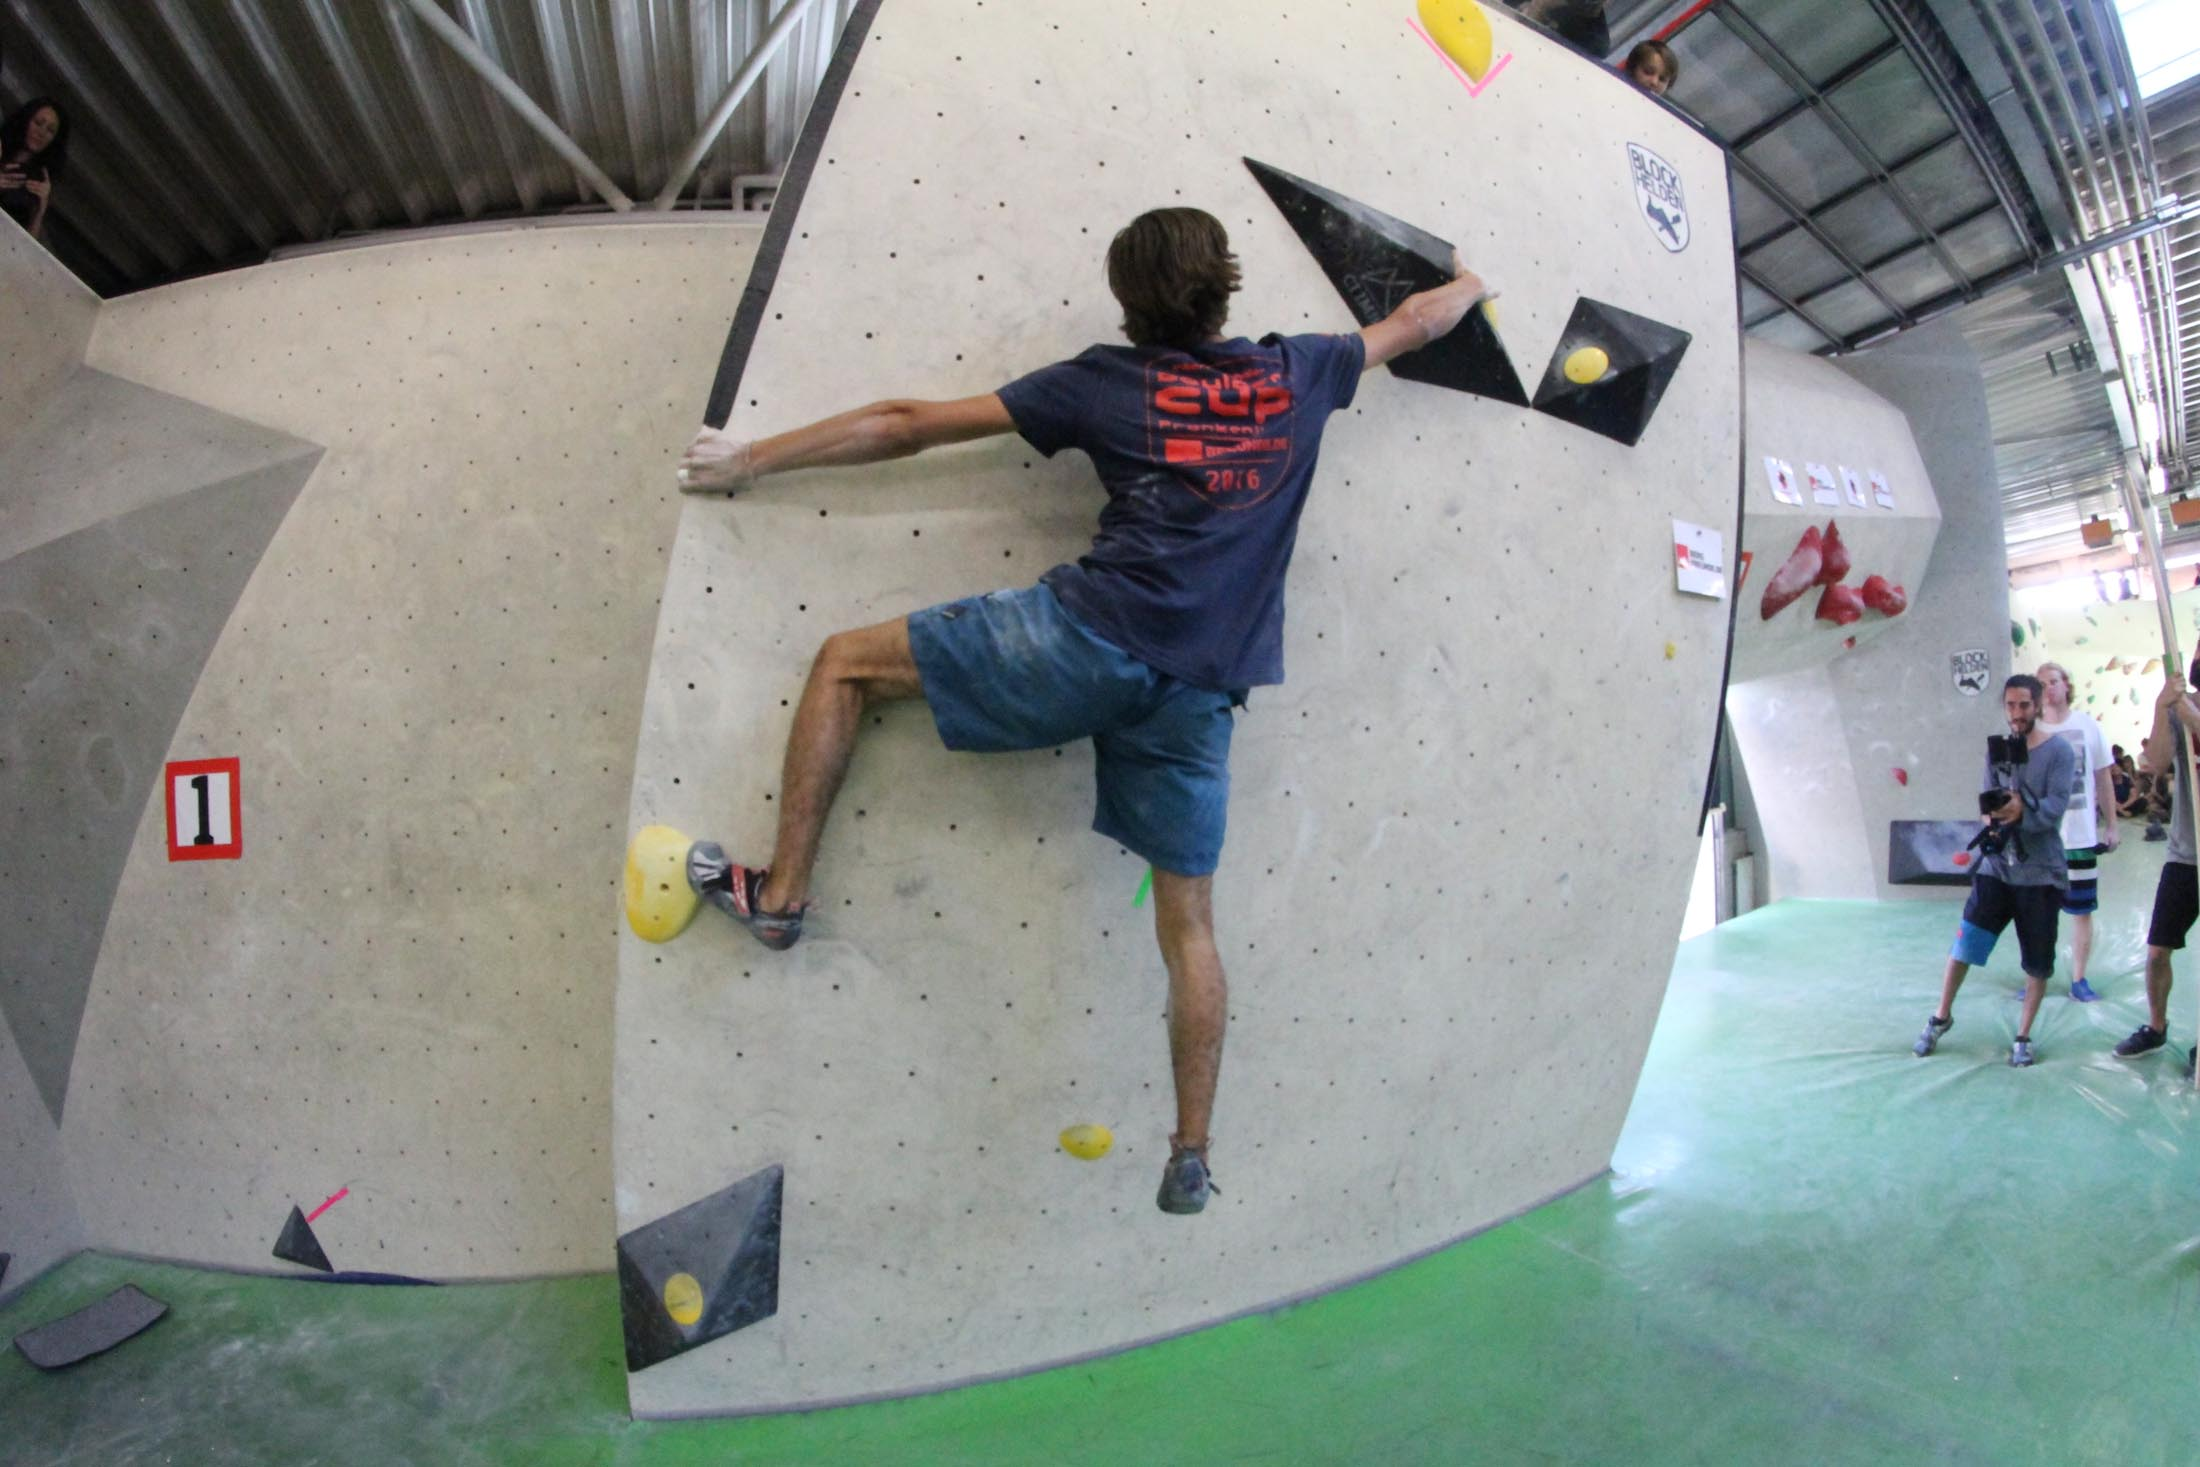 Finale, internationaler bouldercup Frankenjura 2016, BLOCKHELDEN Erlangen, Mammut, Bergfreunde.de, Boulderwettkampf07092016560